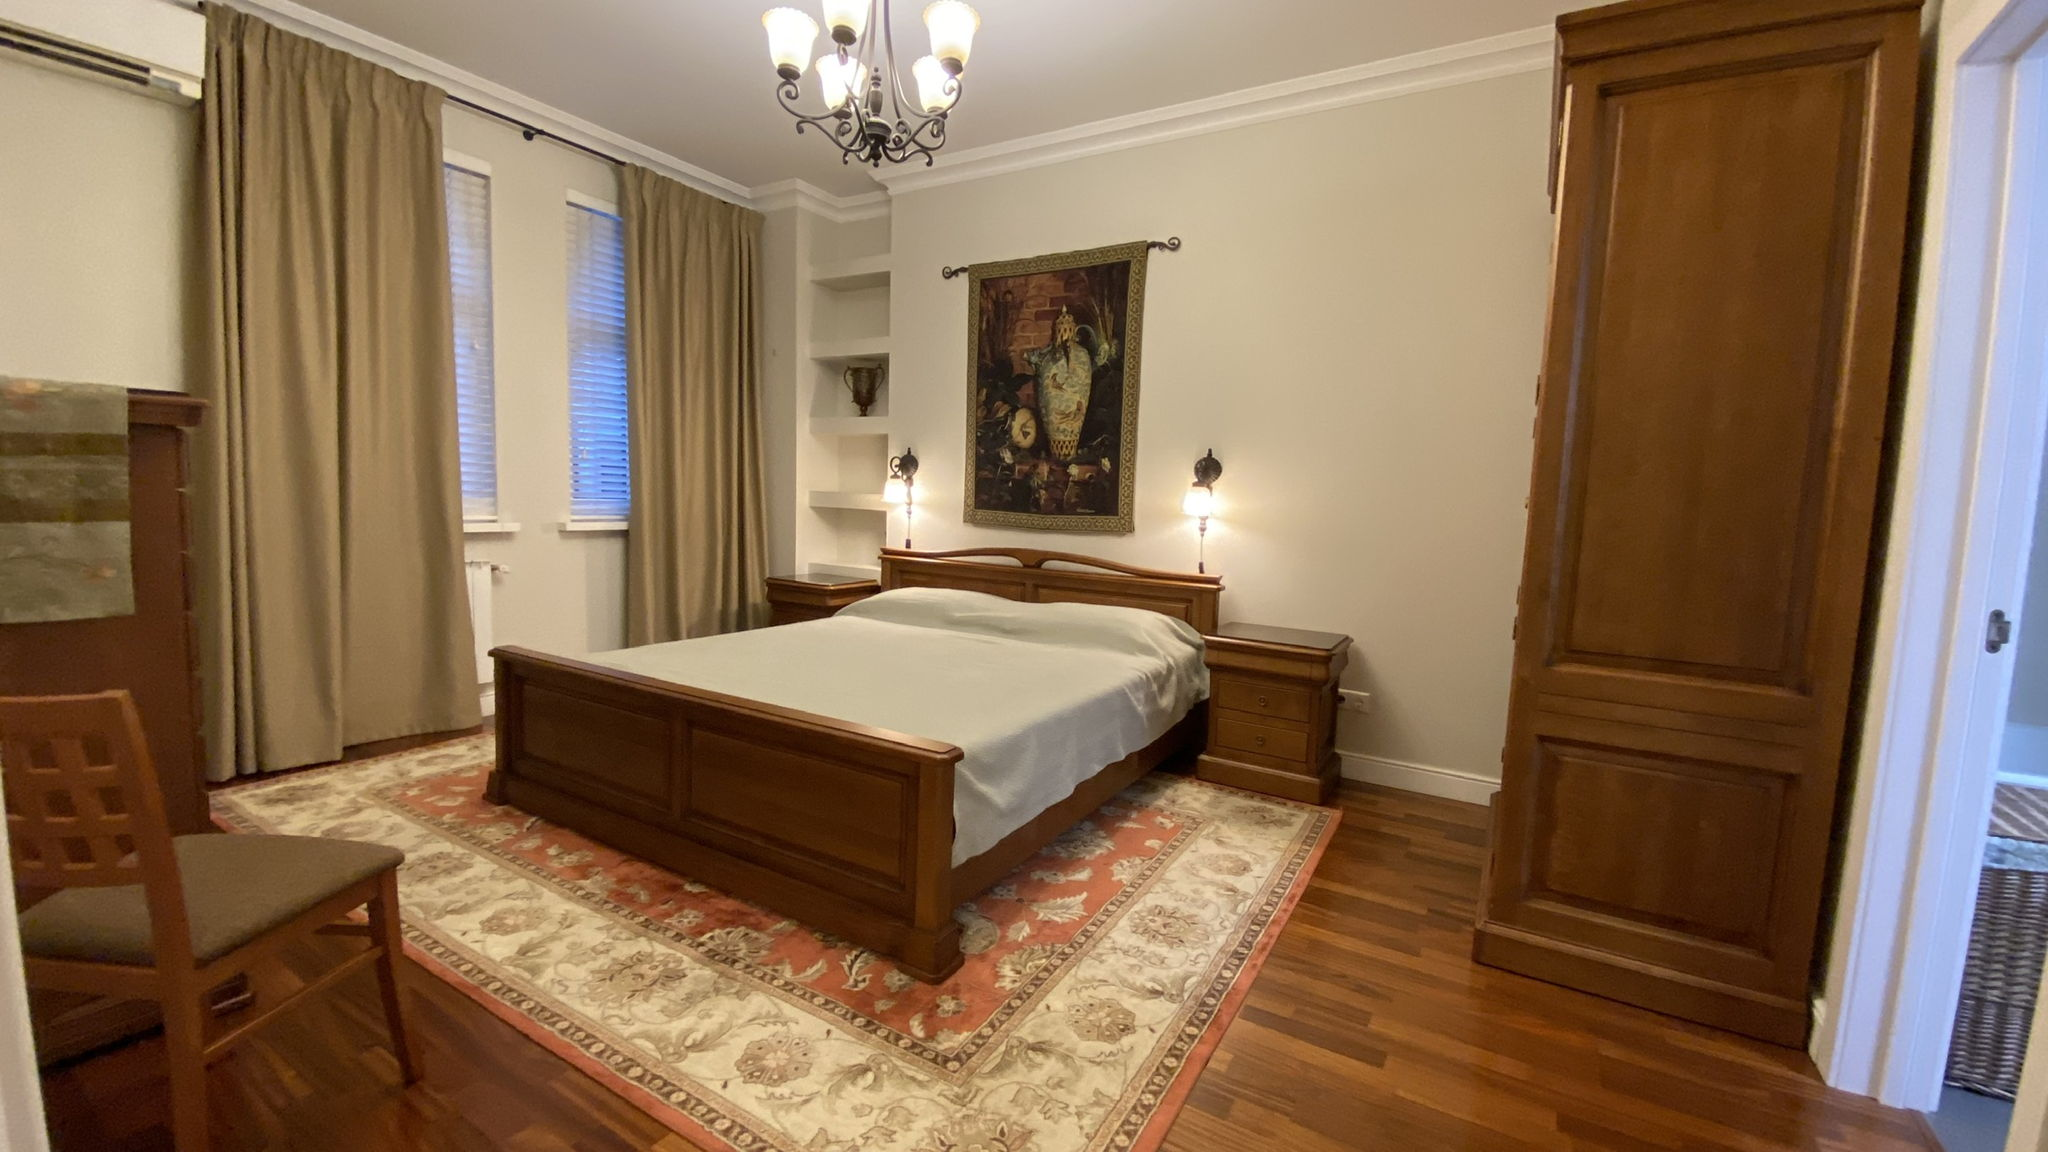 Квартира W-6299627, Спасская, 5, Киев - Фото 5